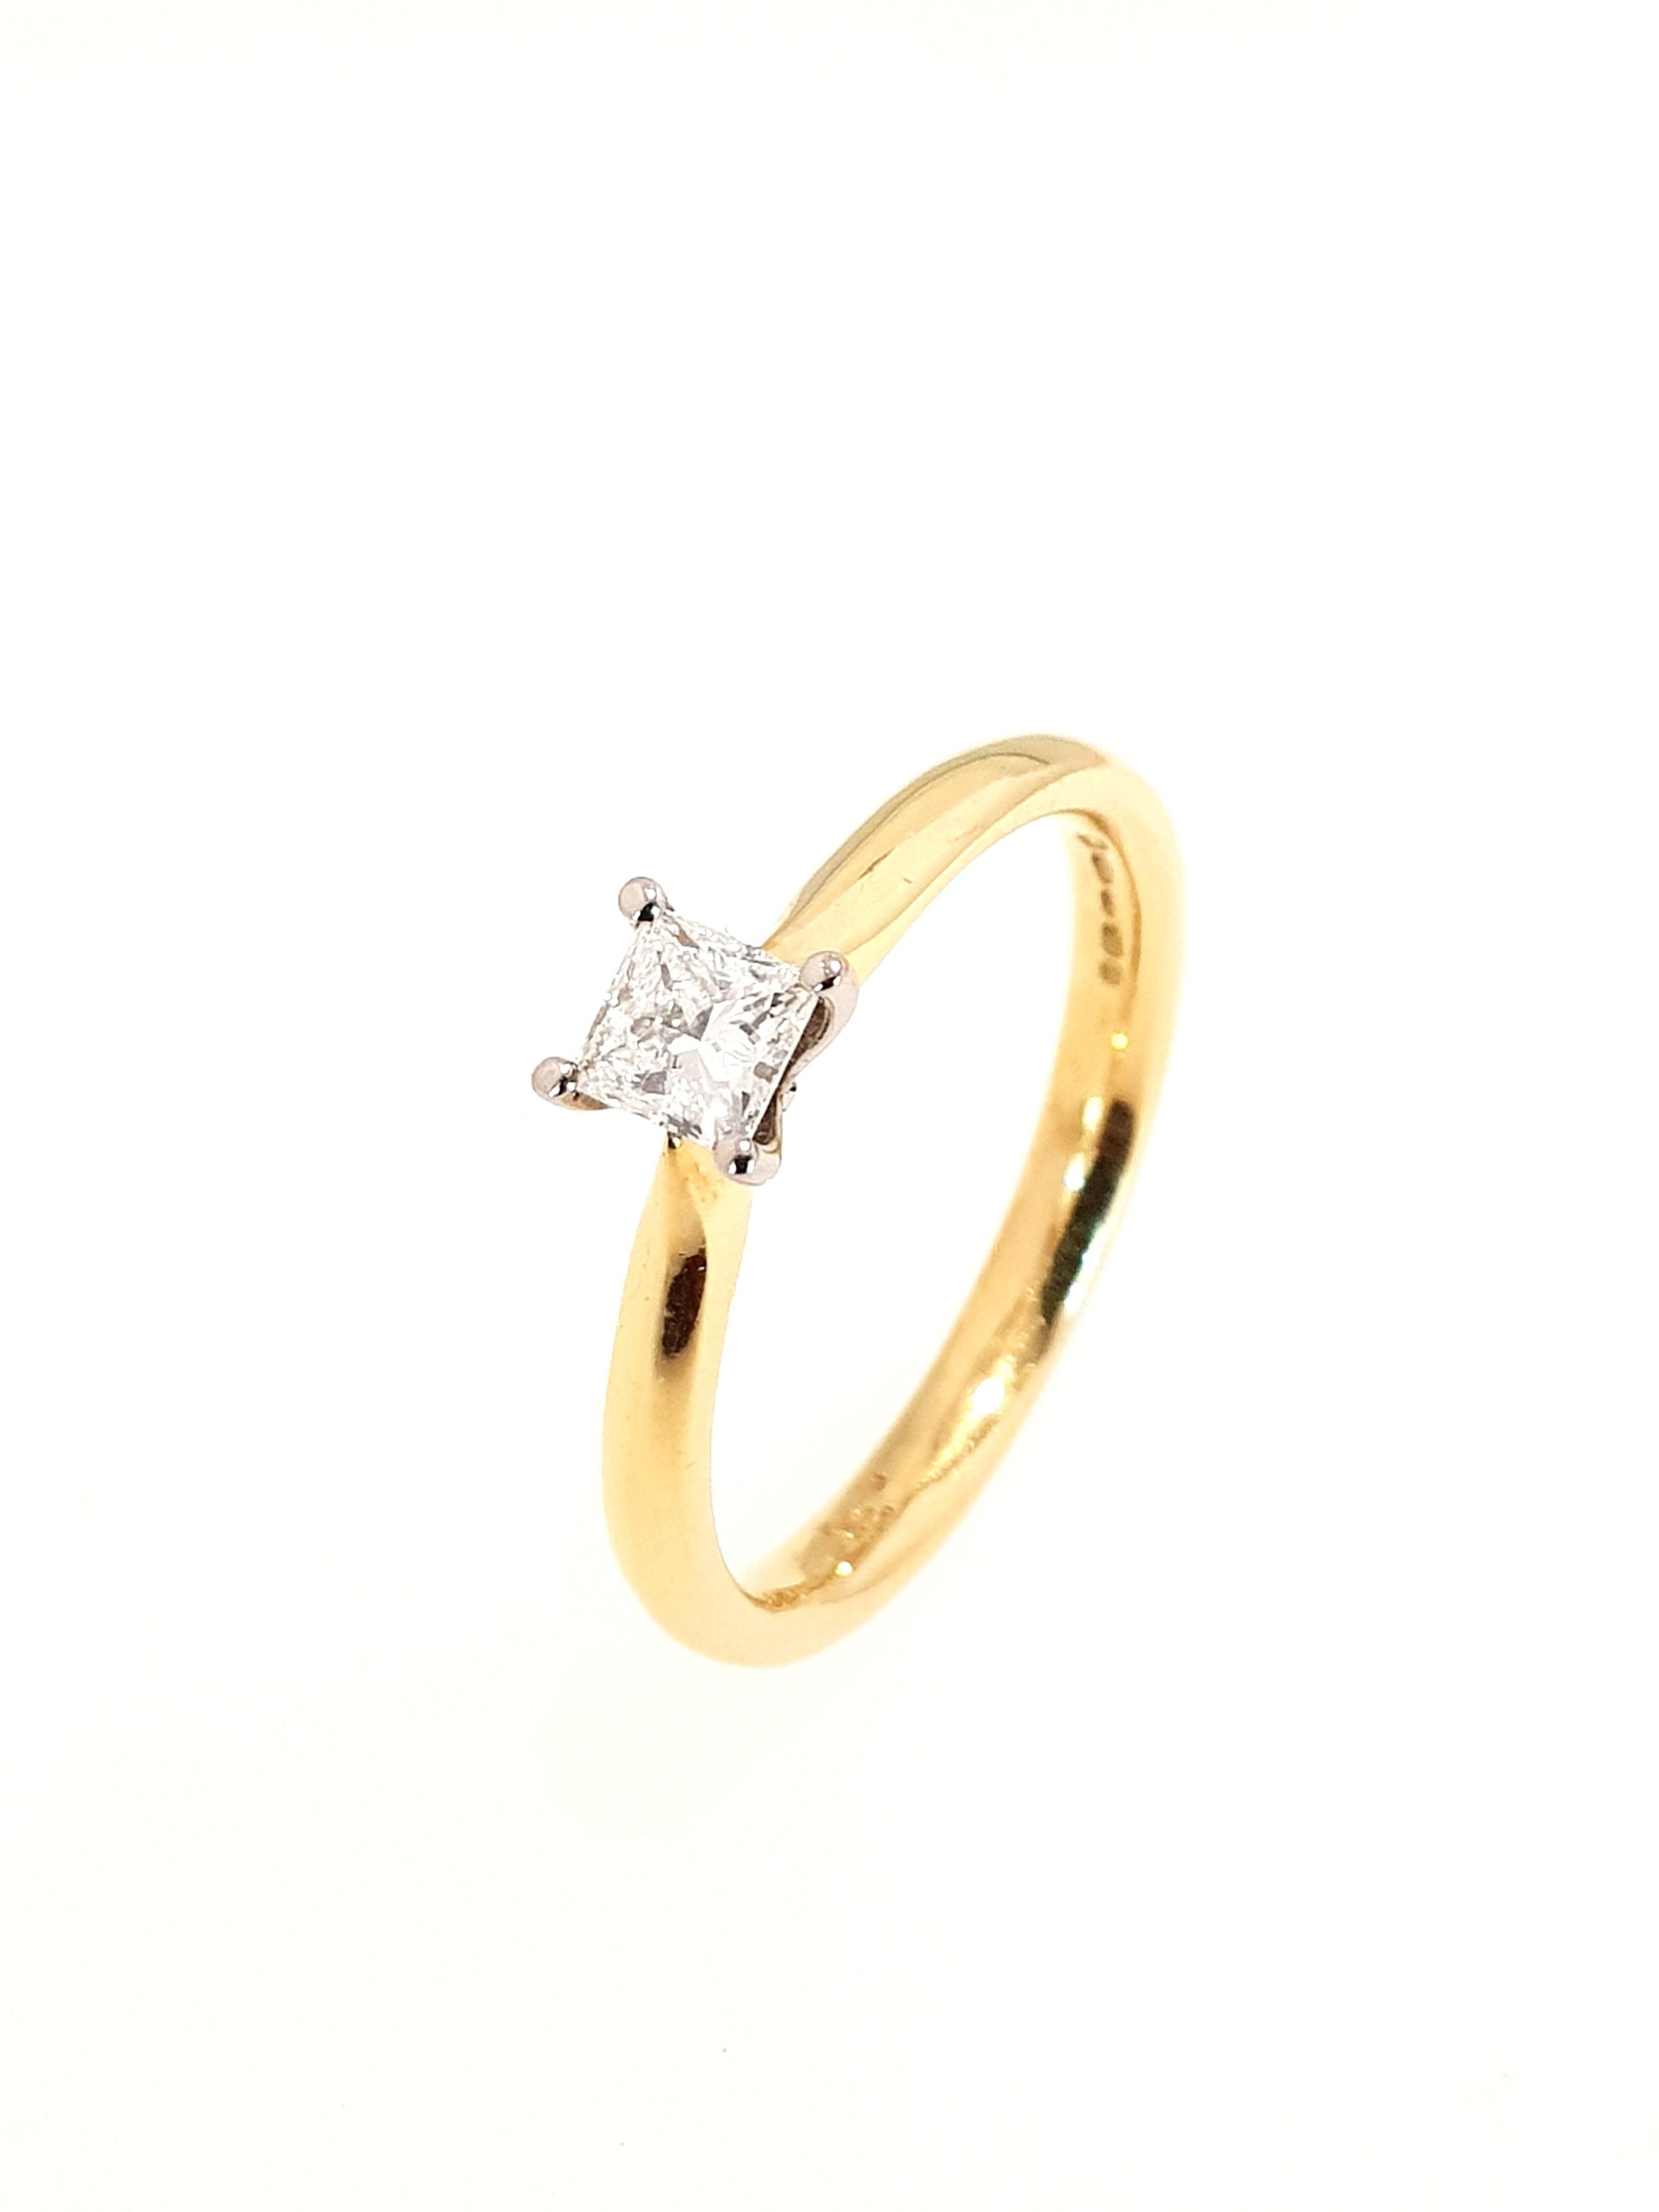 18ct Yellow Gold Diamond Ring, Princess Cut  .26ct, G, Si1  Stock Code: N8582  £1275